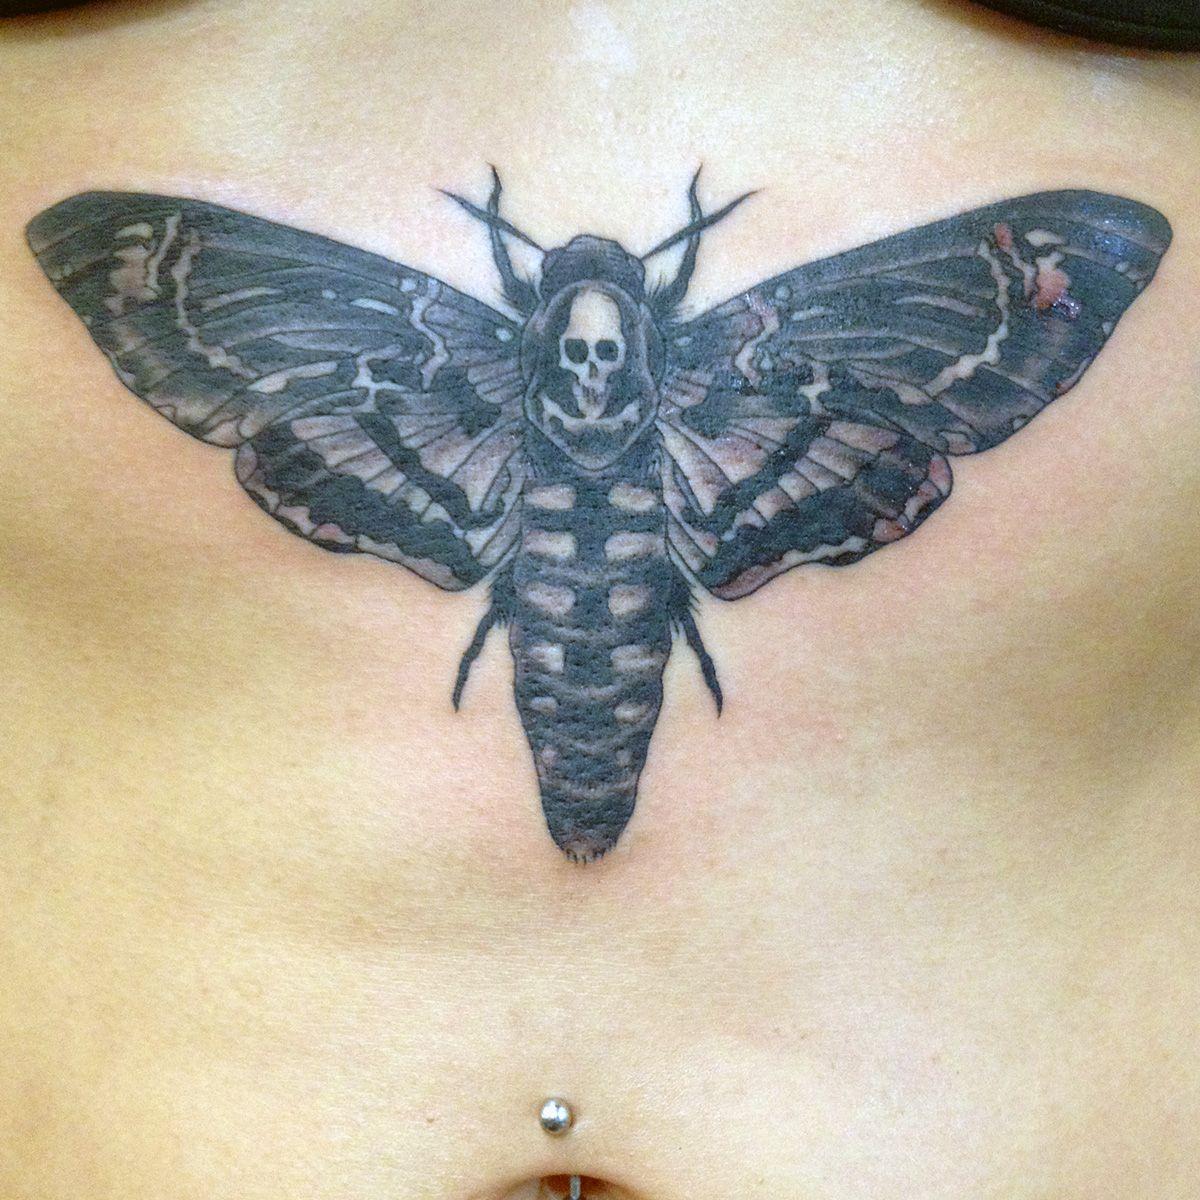 Head Moth Tattoo By Chip Telano All Saints Tattoo Austin Texas